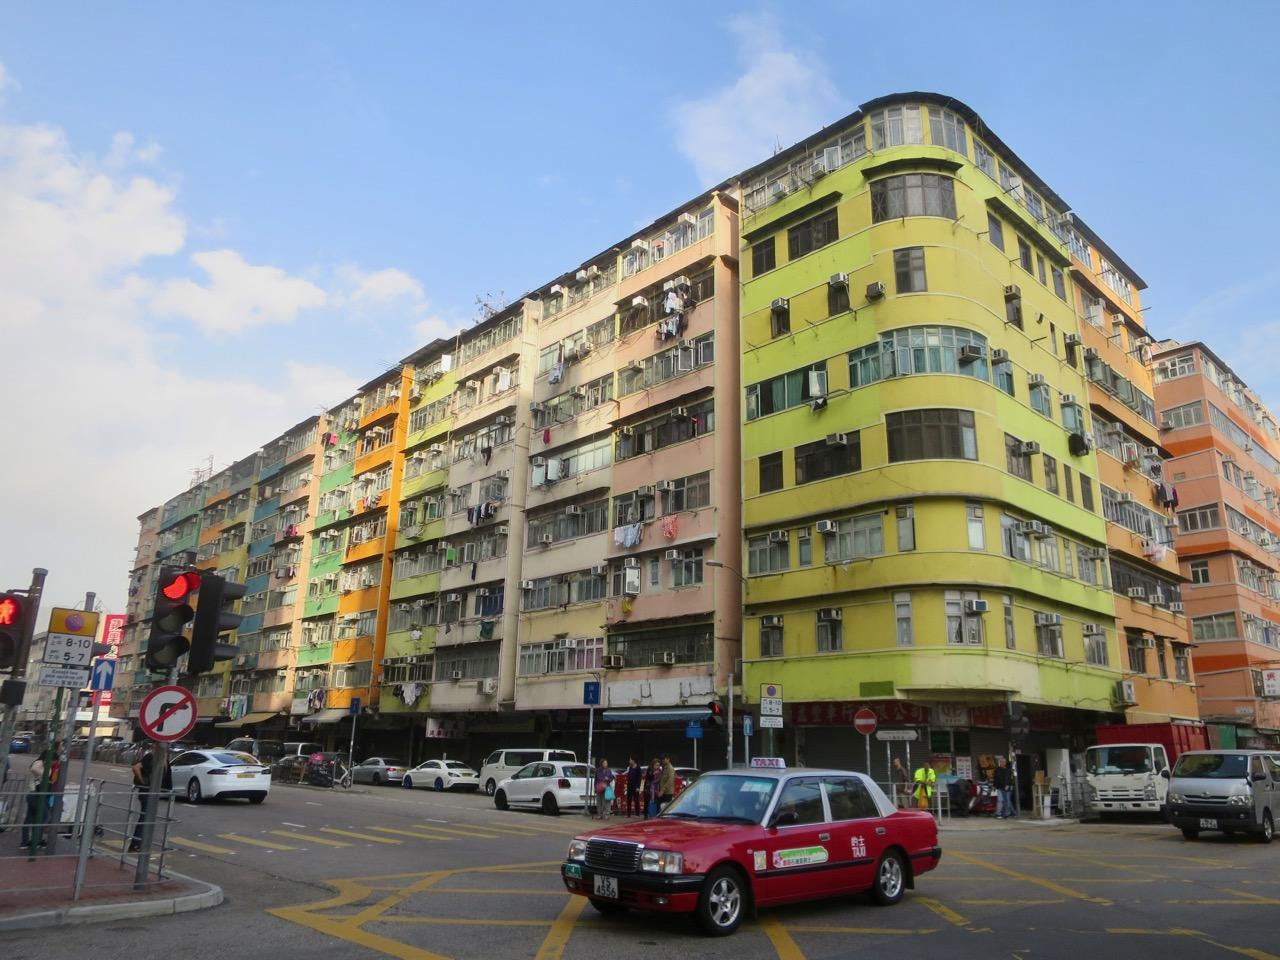 Hong Kong 6 09